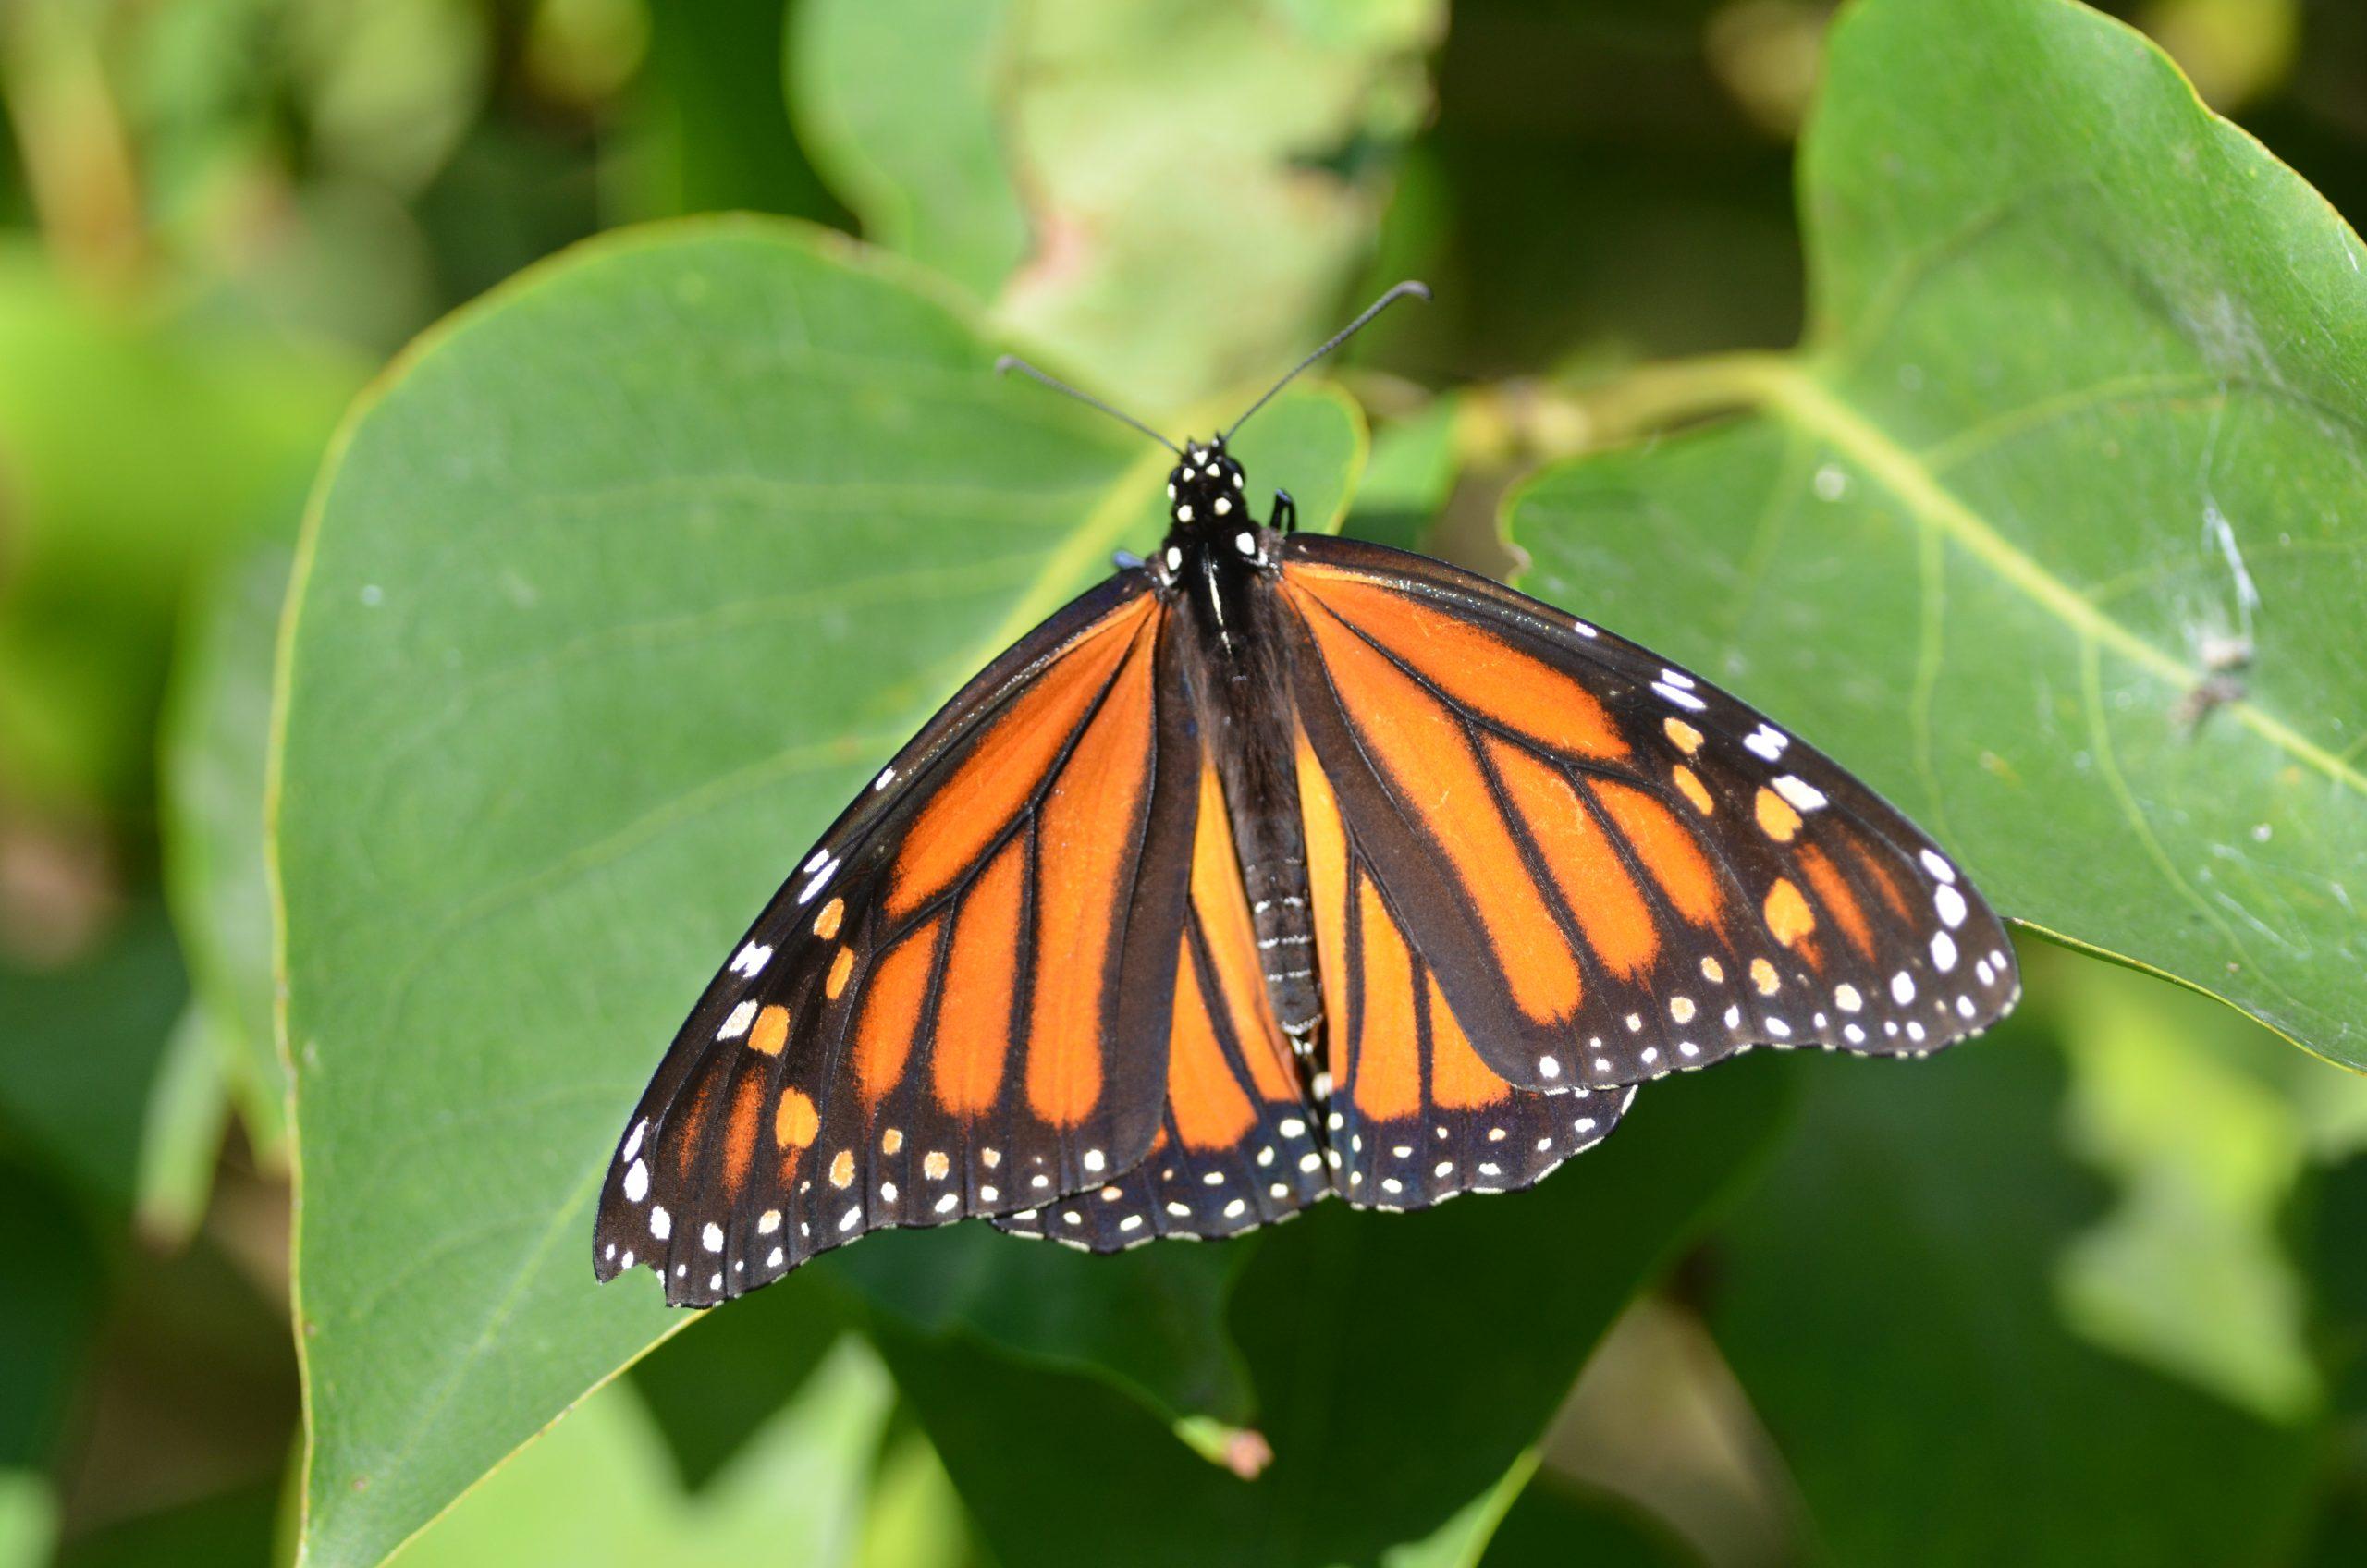 A birds-eye view of a monarch butterfly